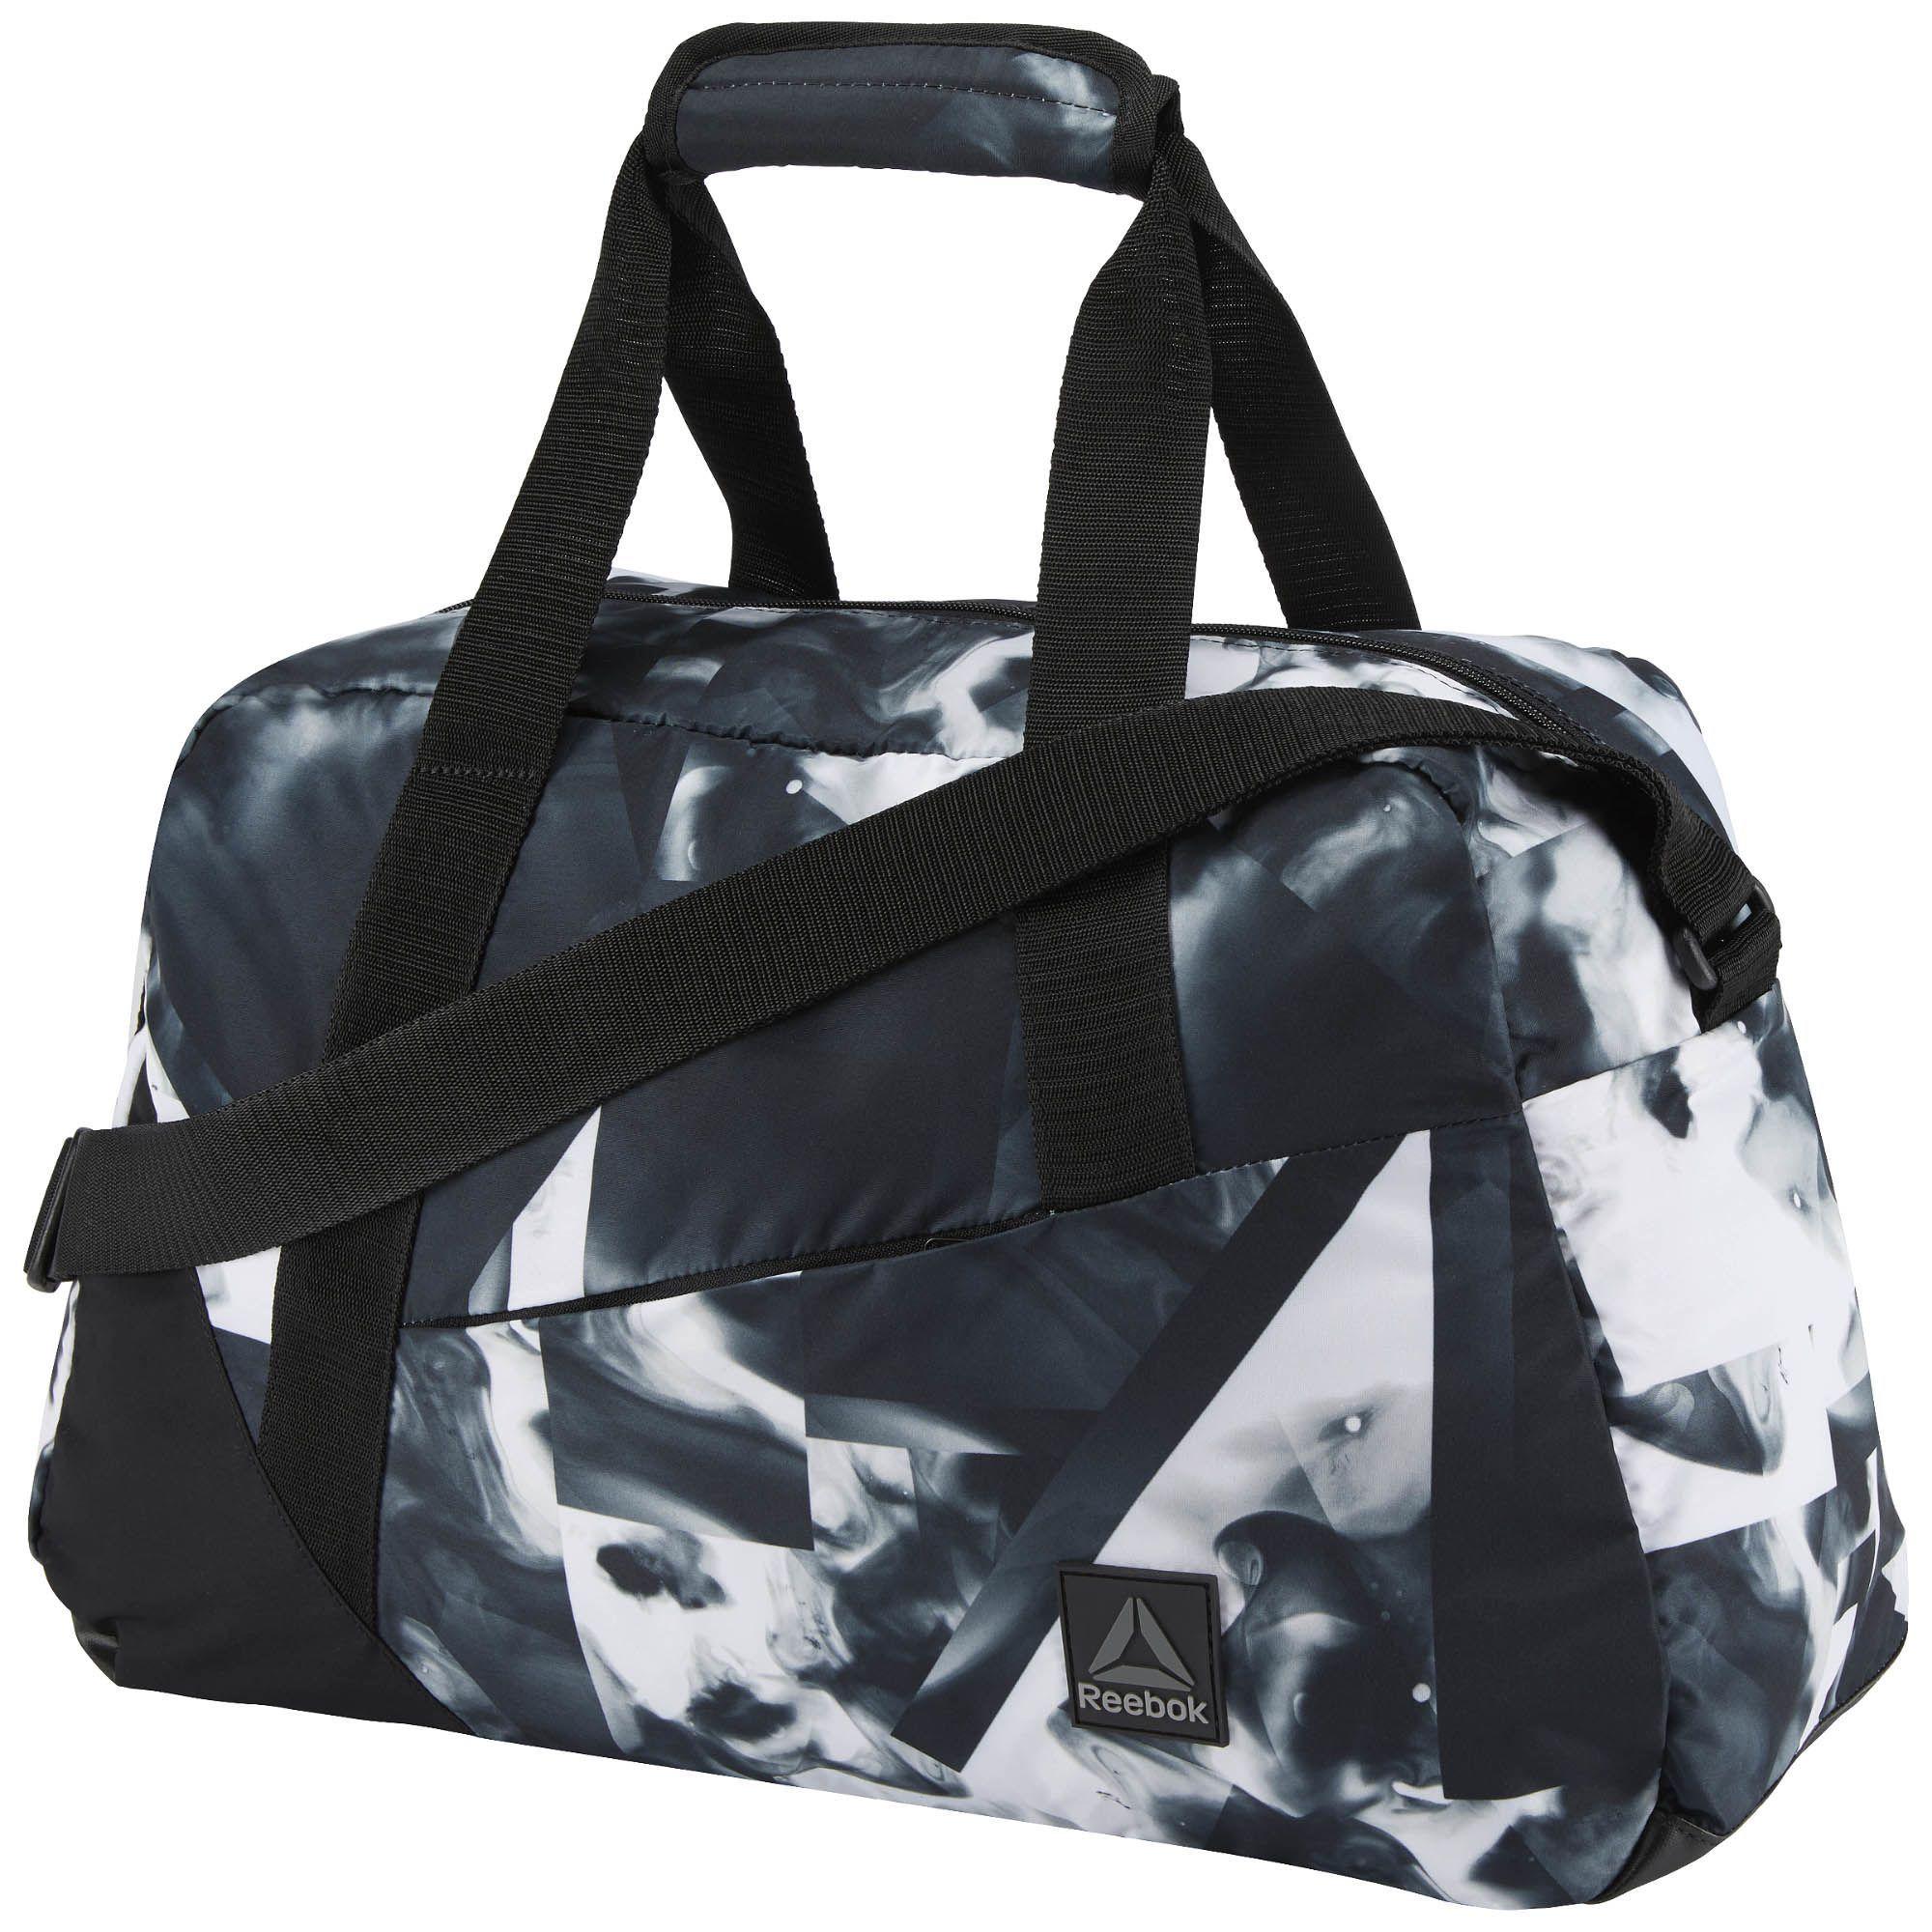 Reebok Graphic Grip Duffle Bag